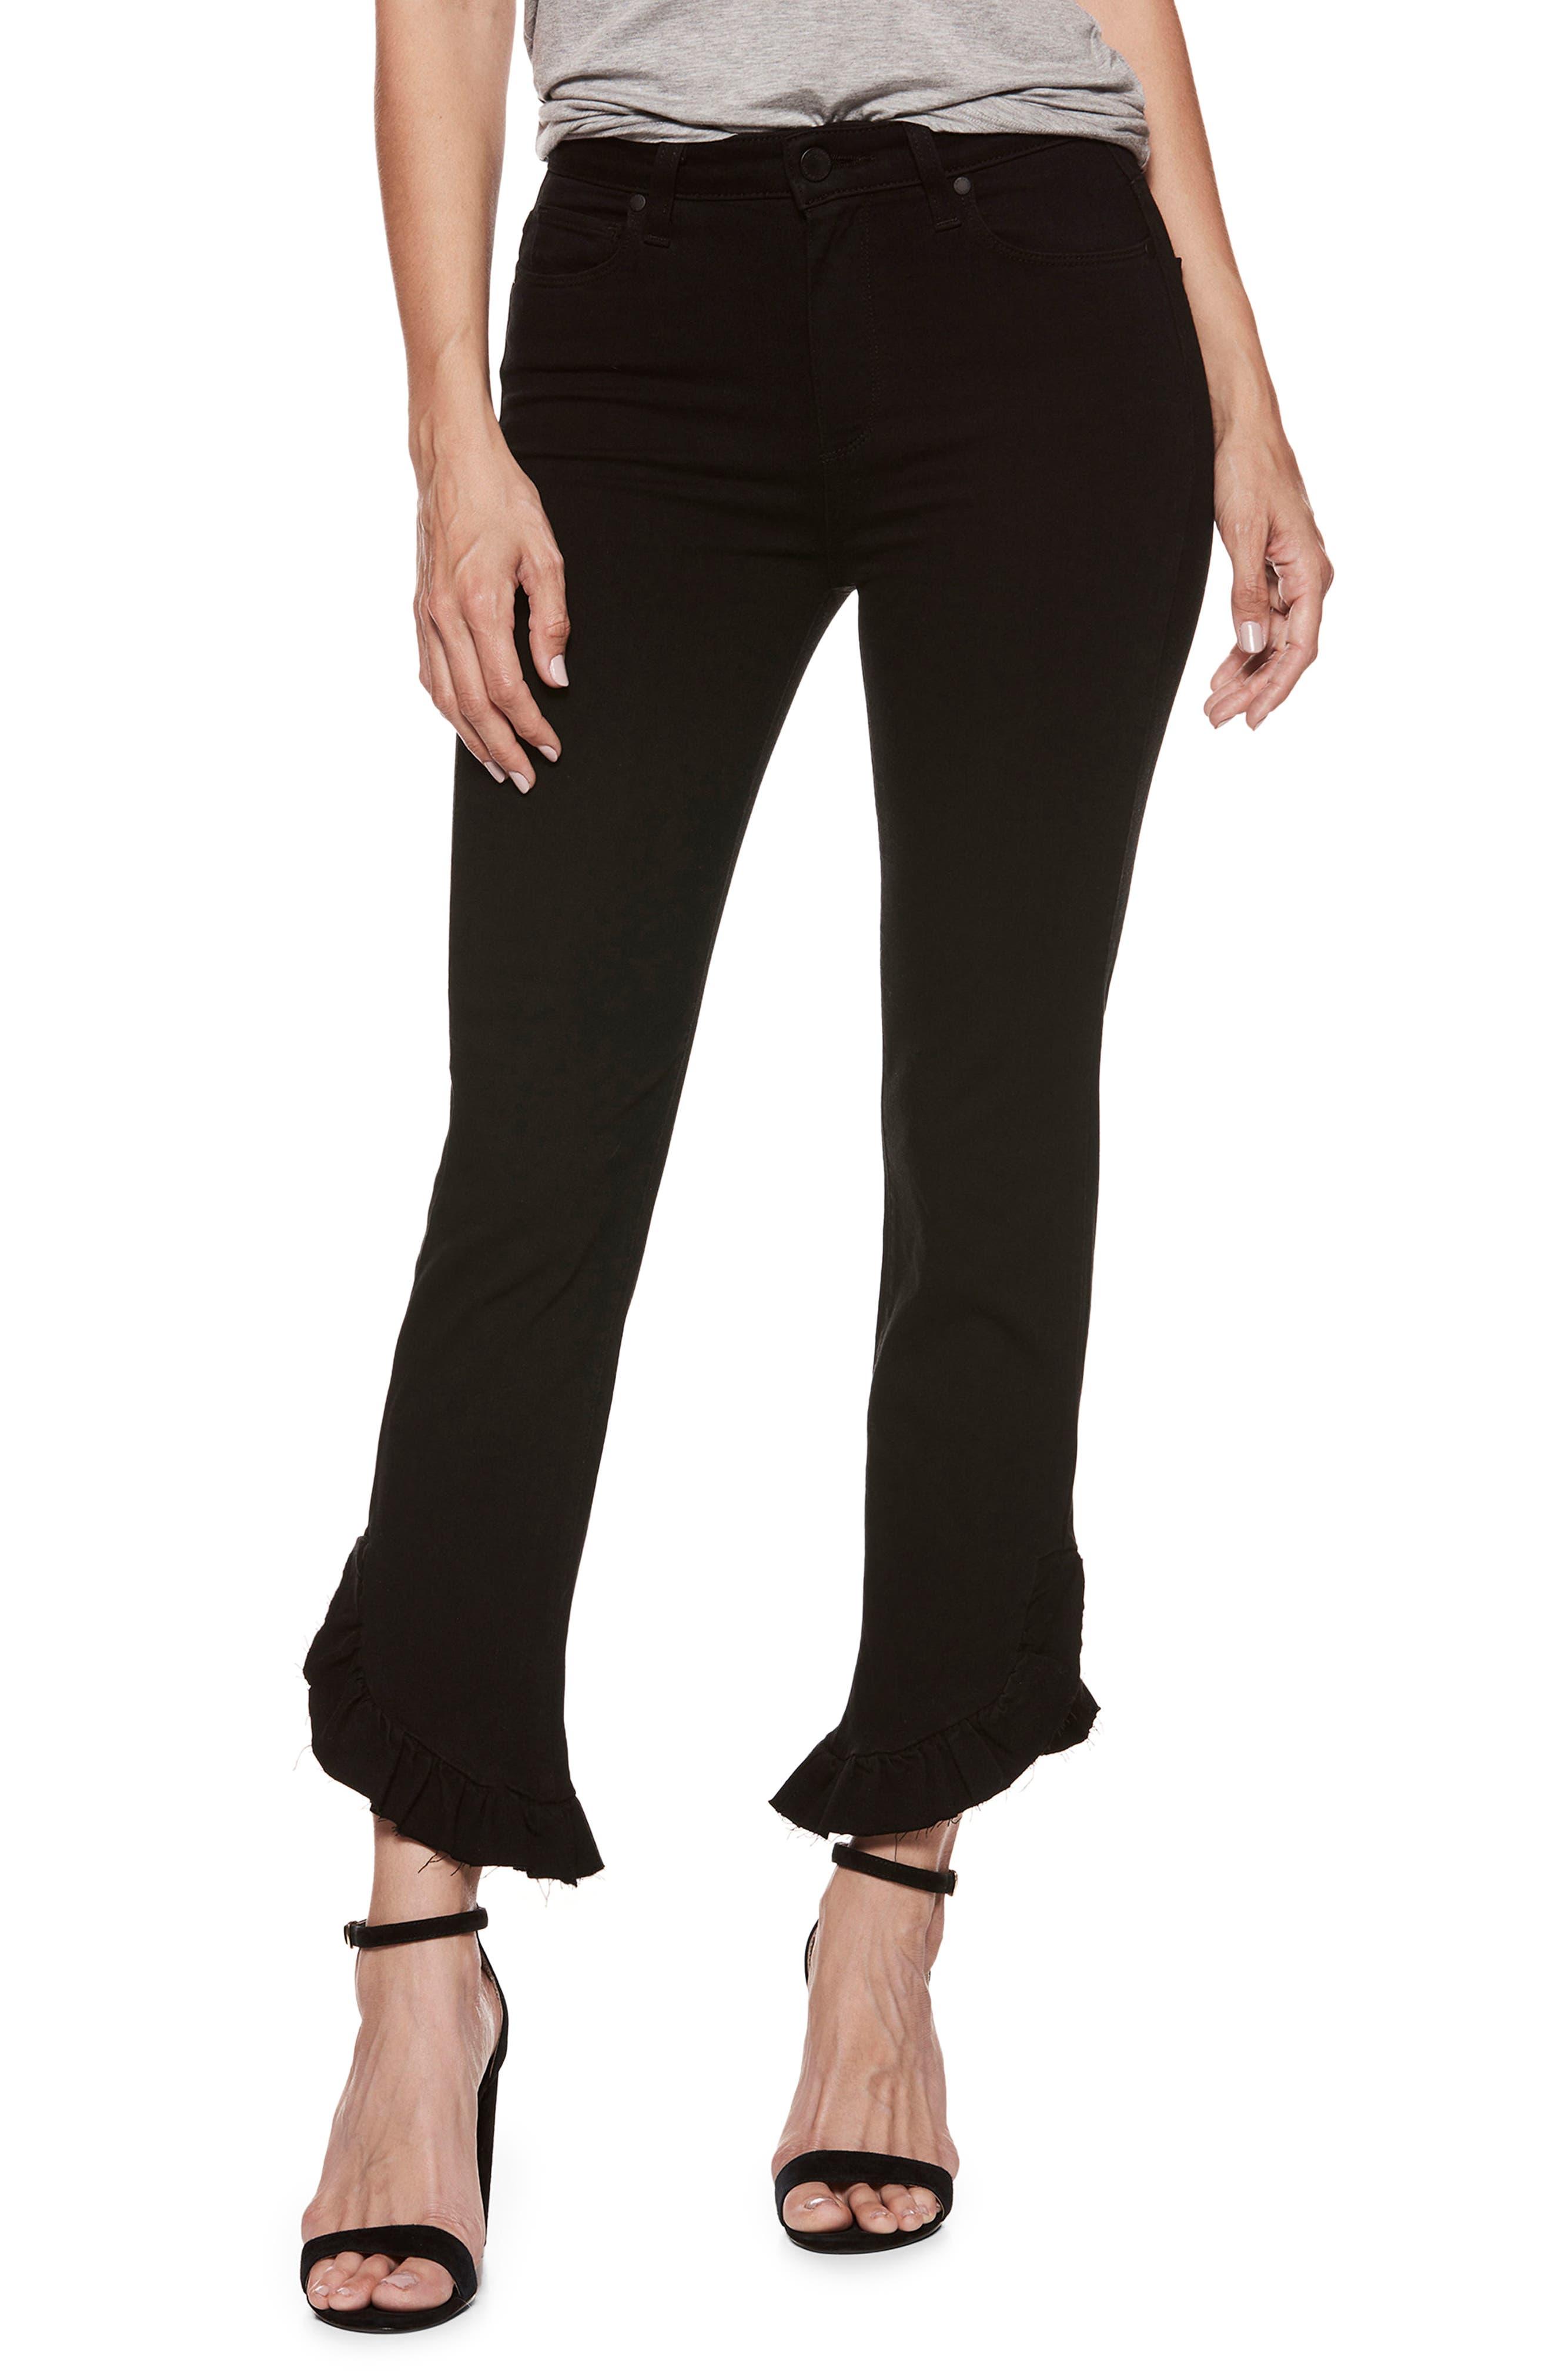 Transcend - Hoxton High Waist Ankle Straight Leg Jeans,                         Main,                         color, Black Shadow